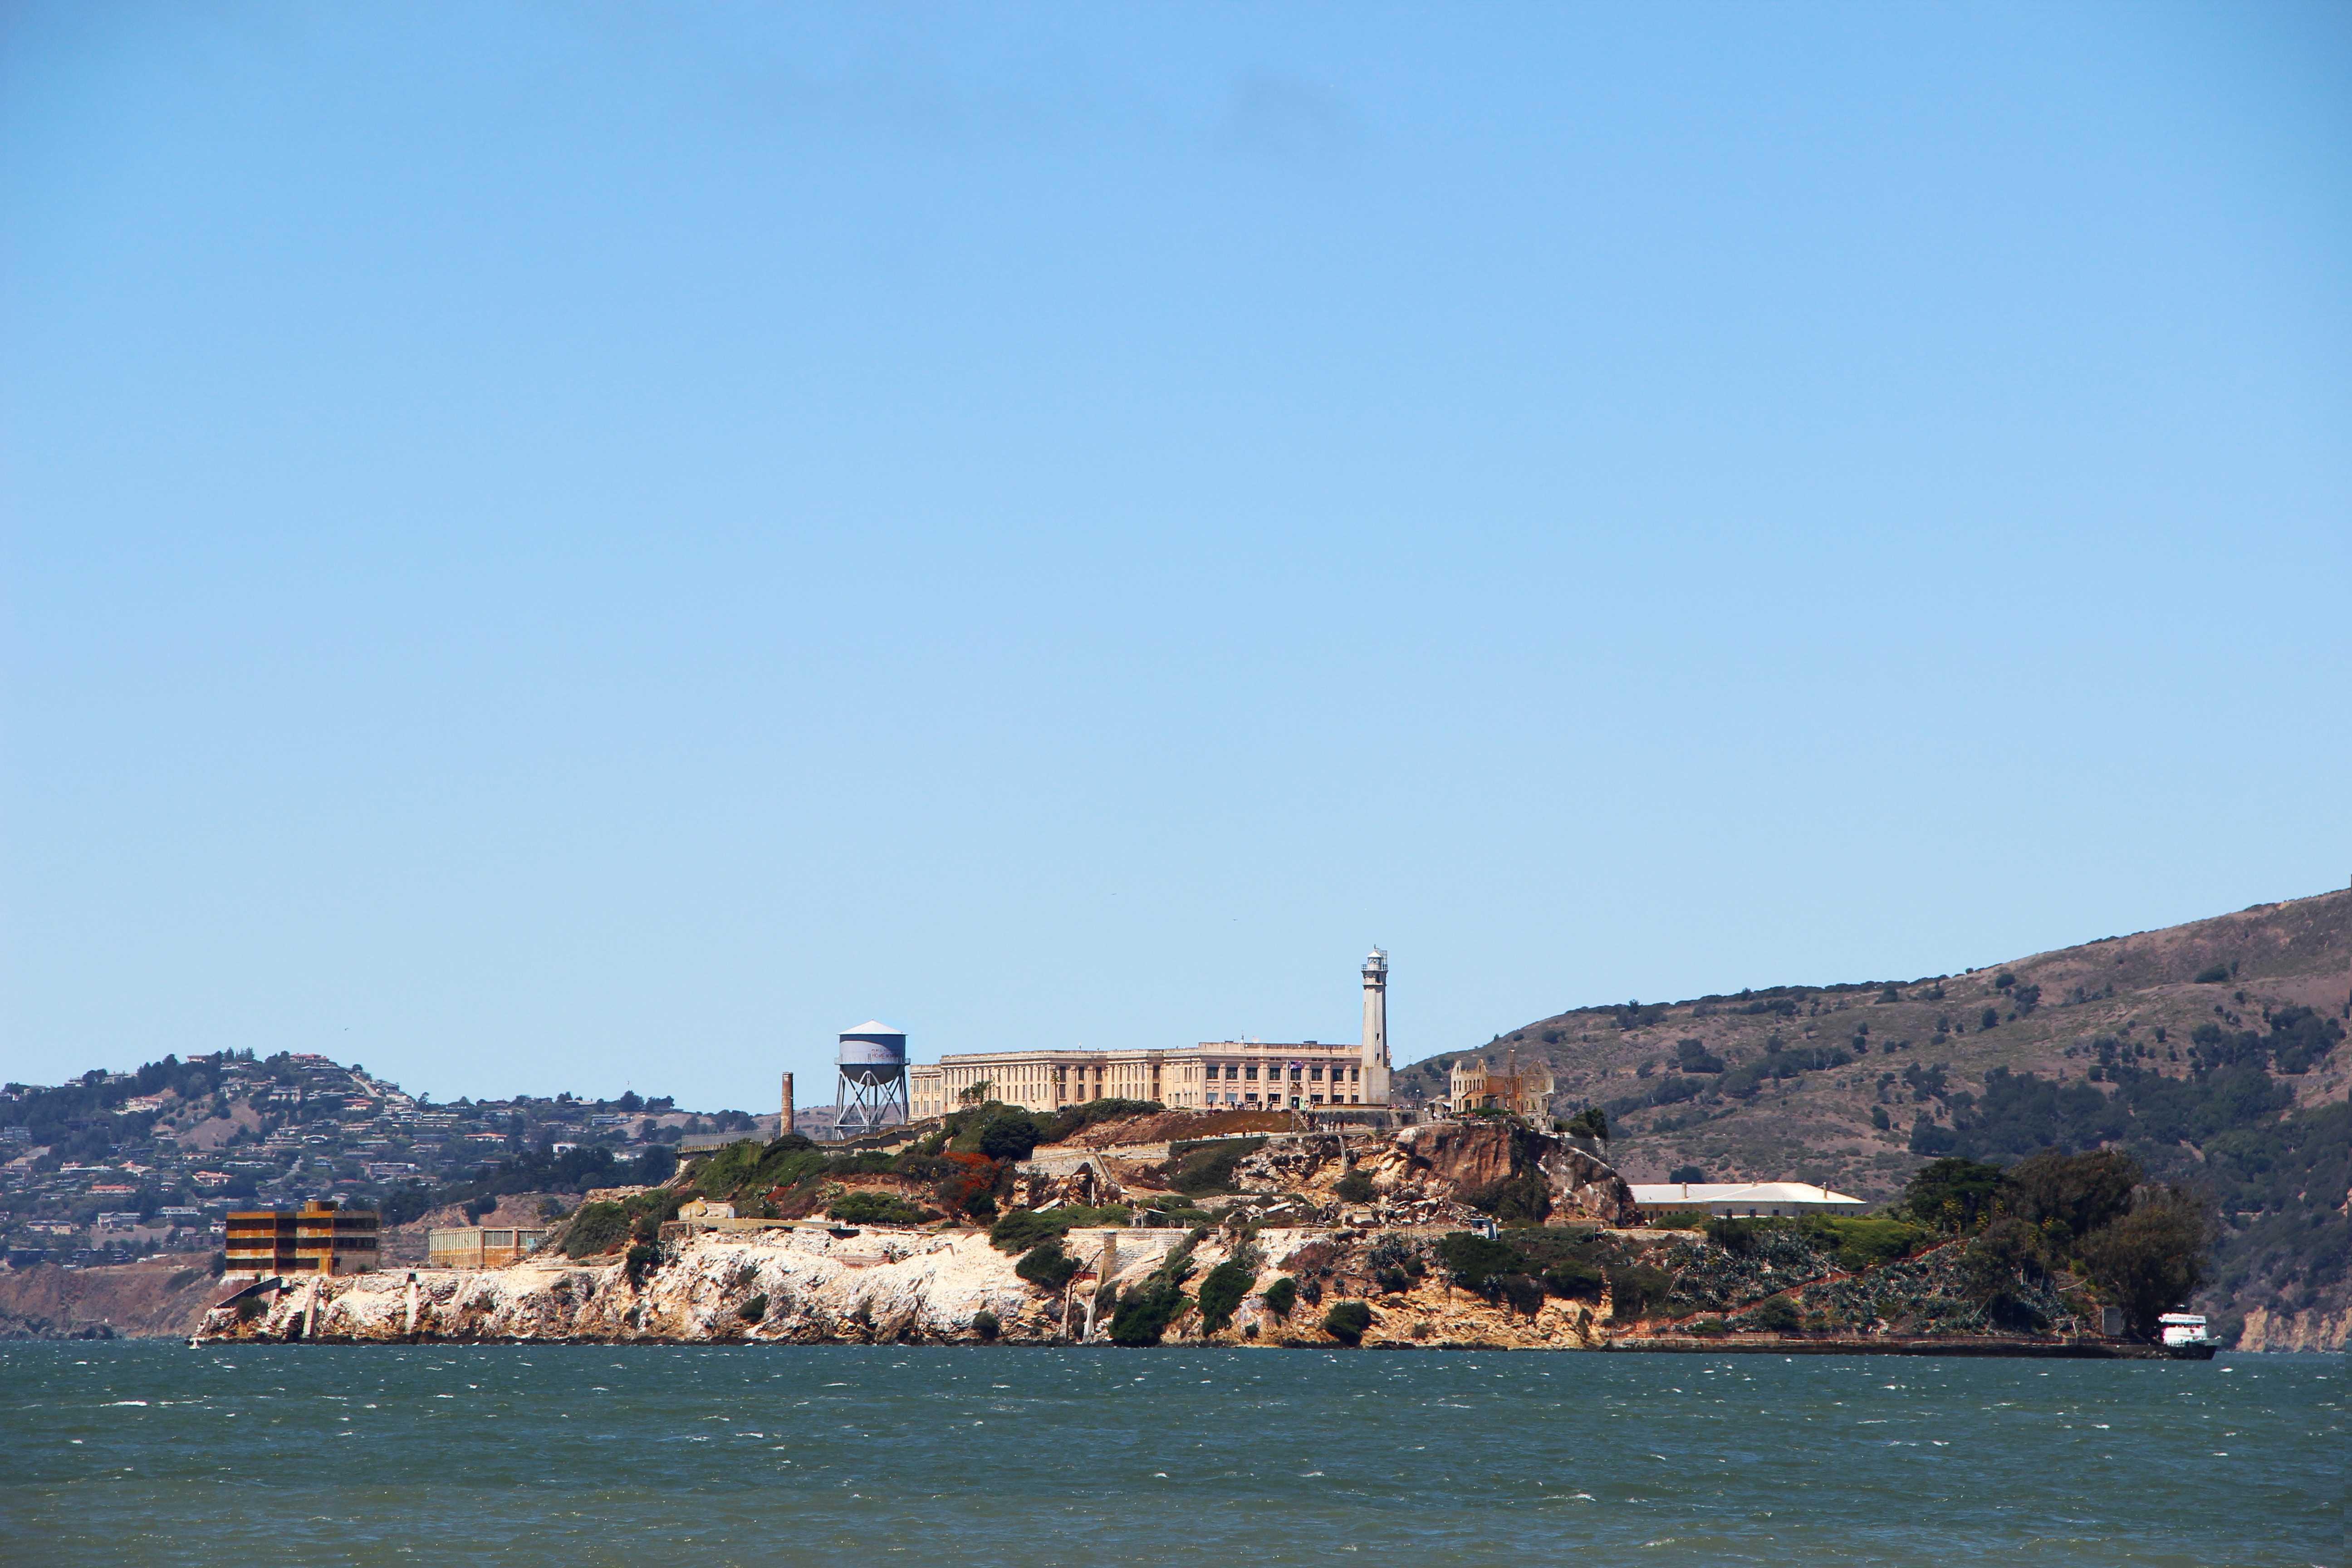 prison on an island